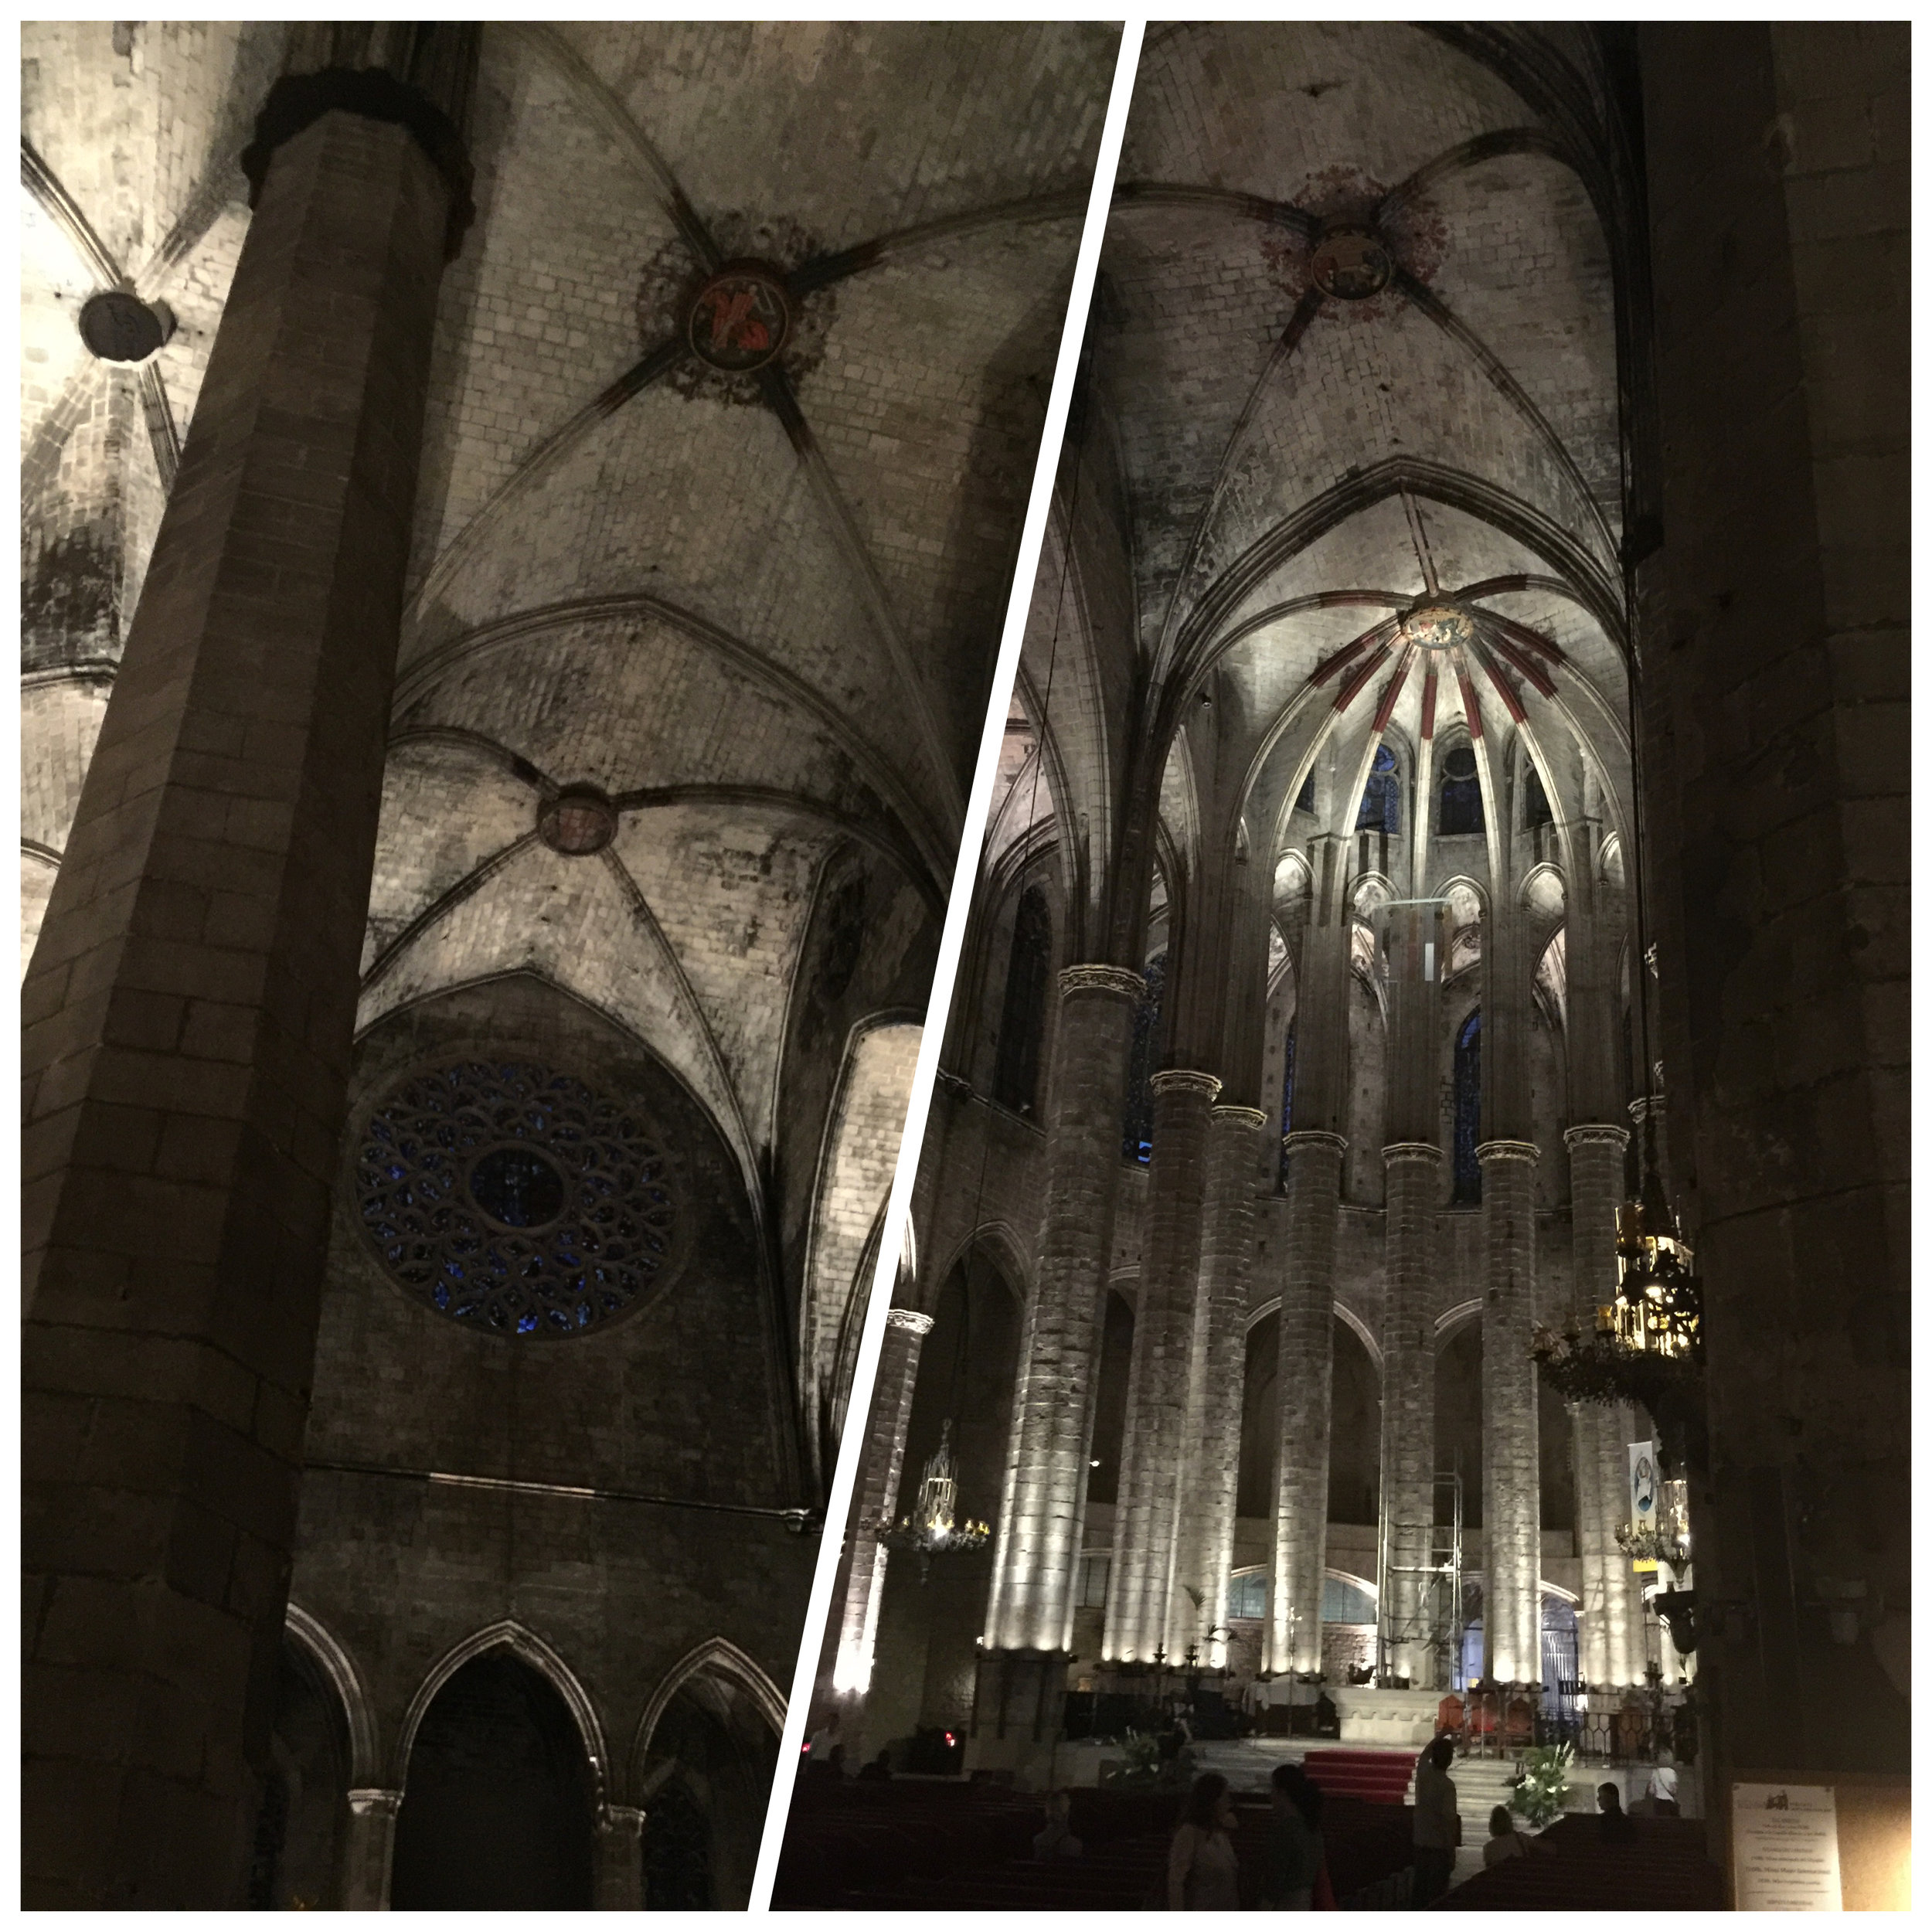 Night view inside a church